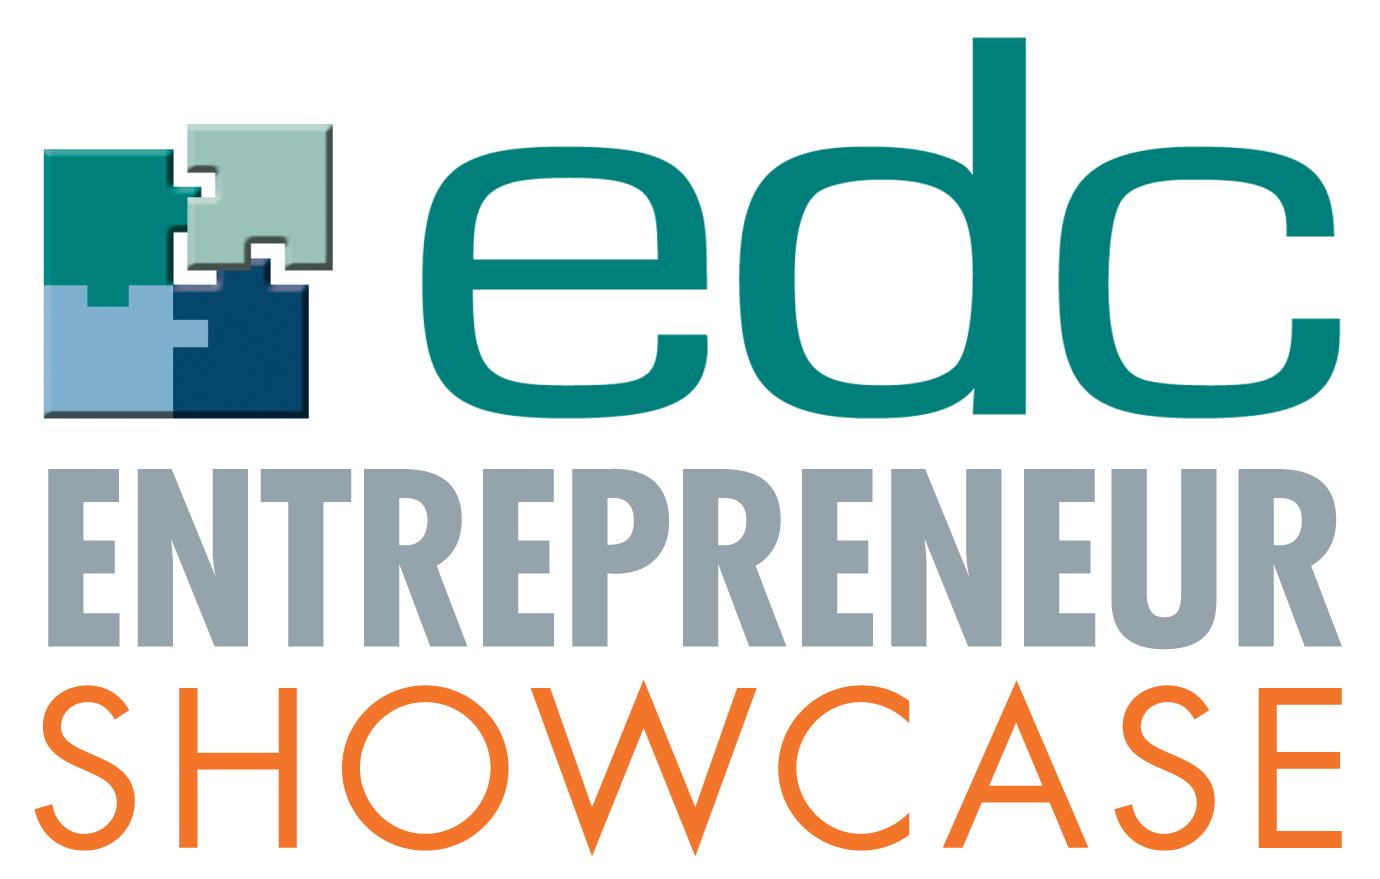 Entrepreneur Showcase